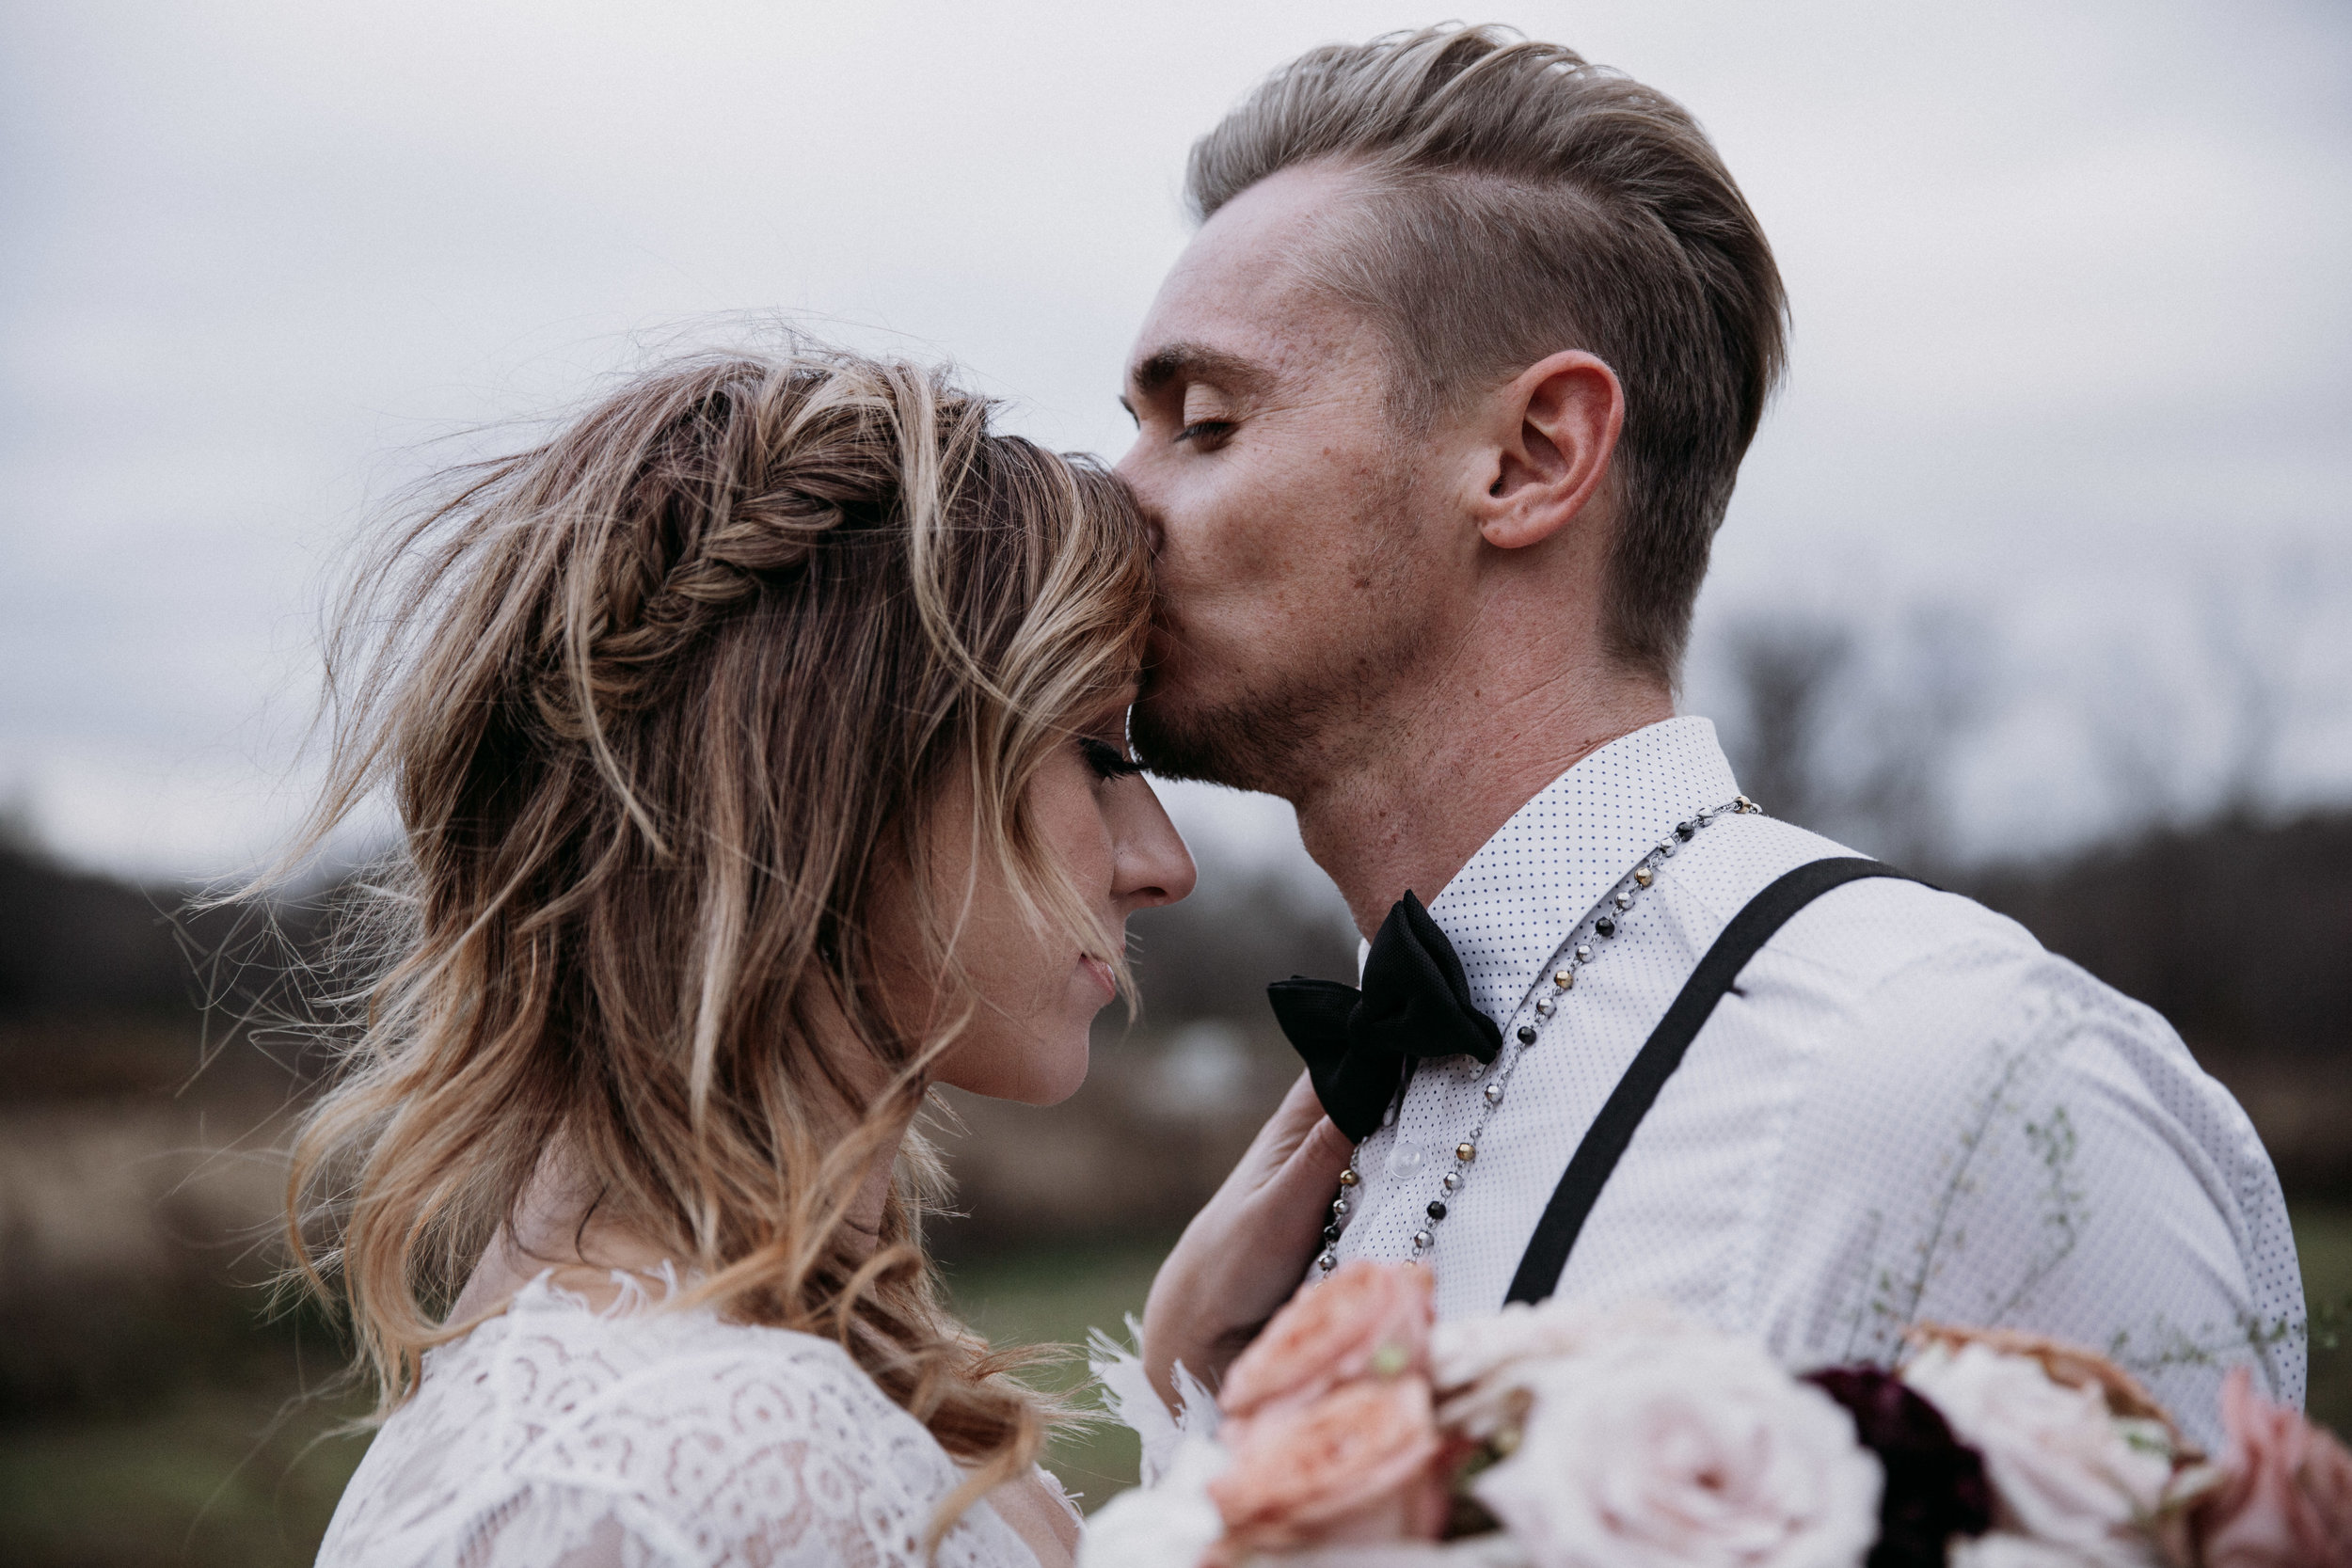 photo caption:   Masha Photographe  : When shooting weddings, Masha focuses on candid moments using artistic style to create that perfect shot.